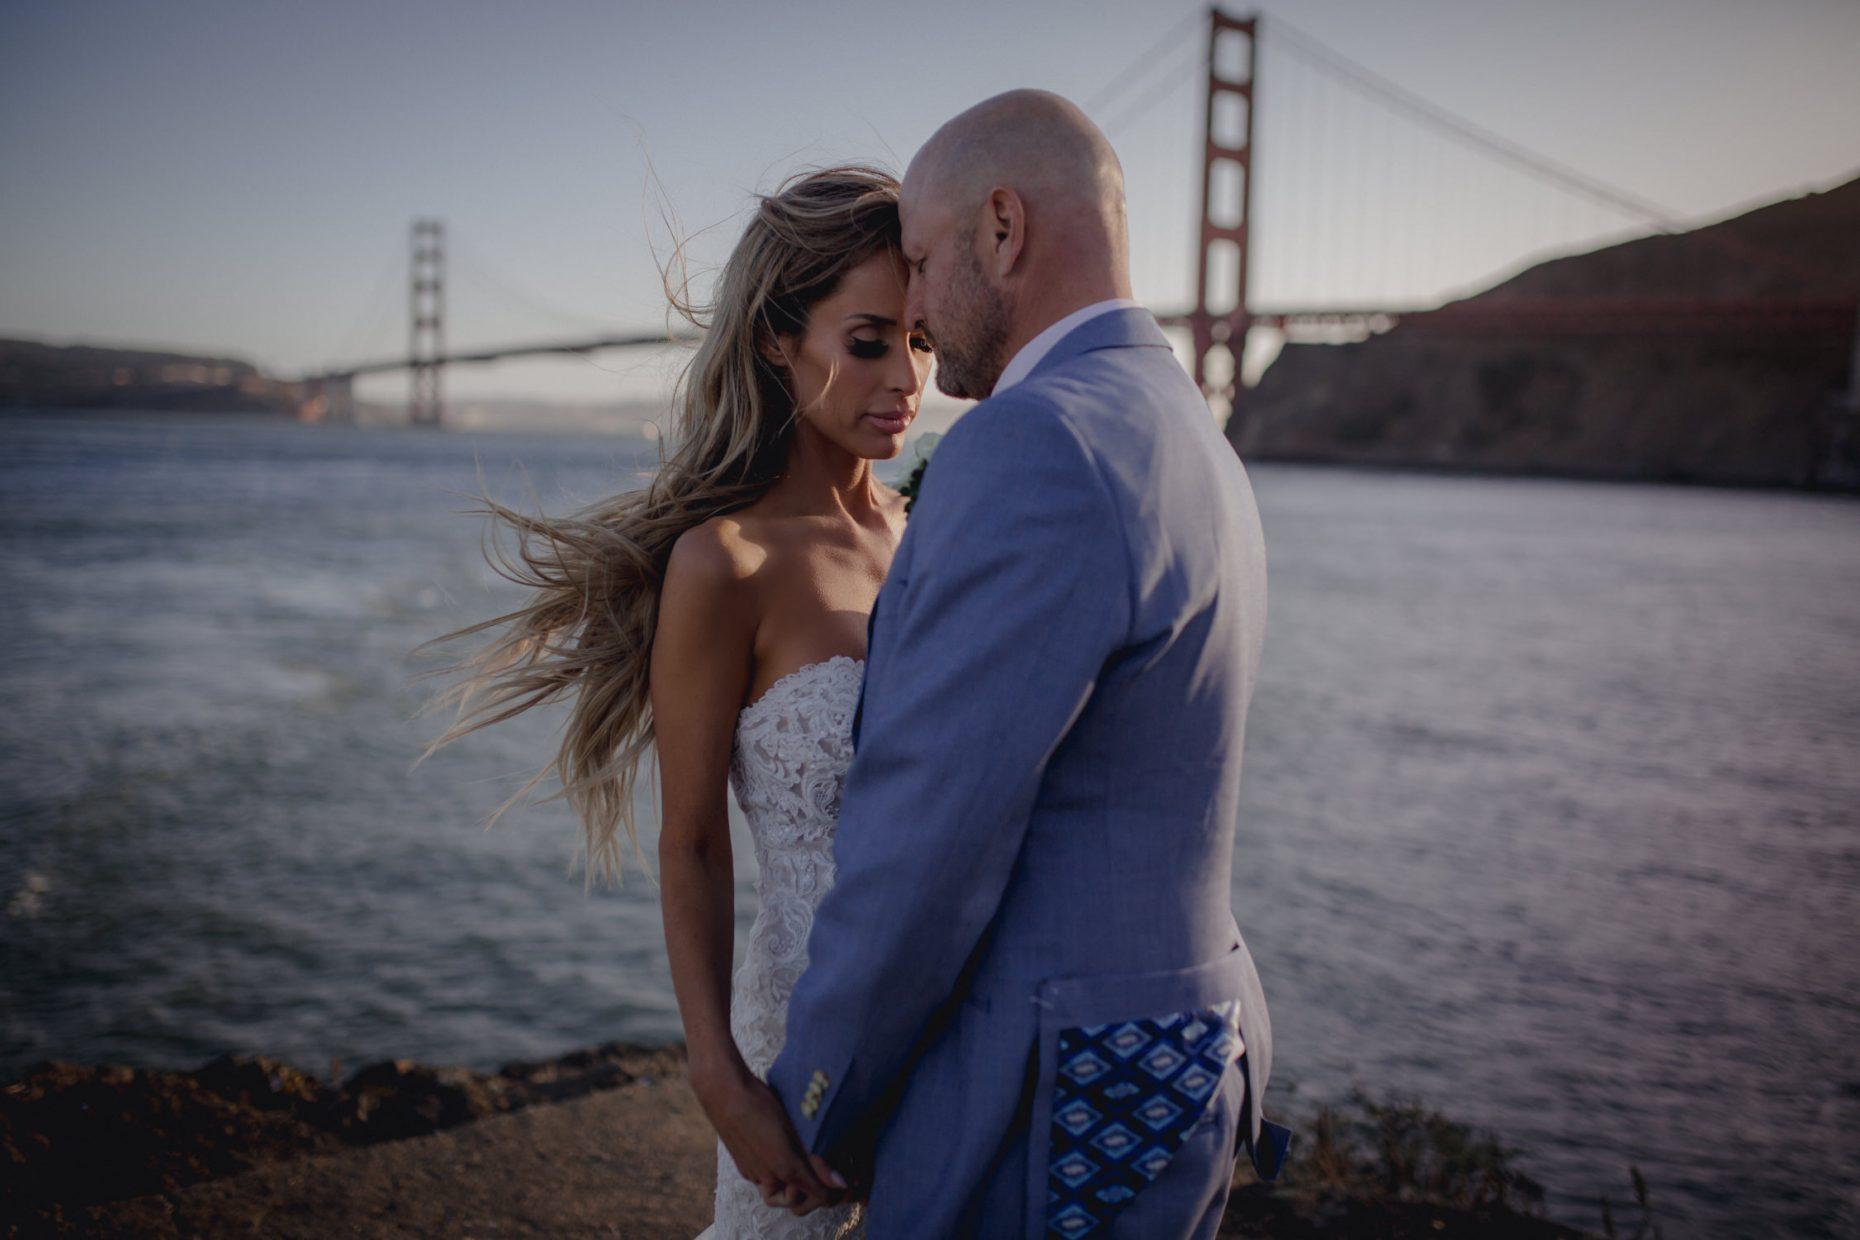 Couple embraced near Golden Gate Bridge